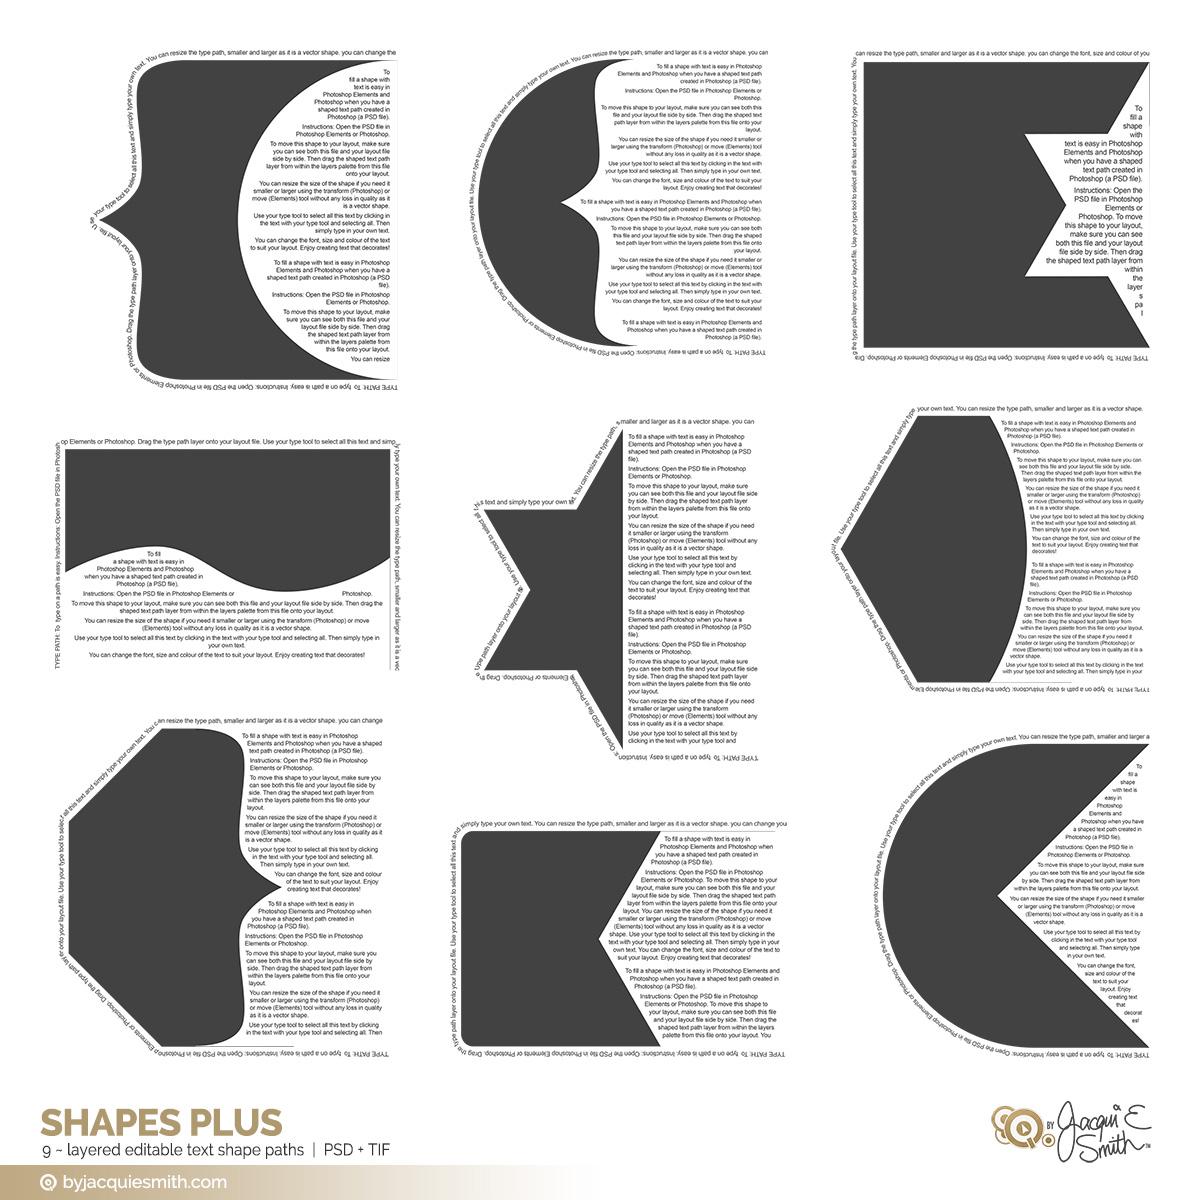 Shapes Plus editable layered templates at byjacquiesmith.com